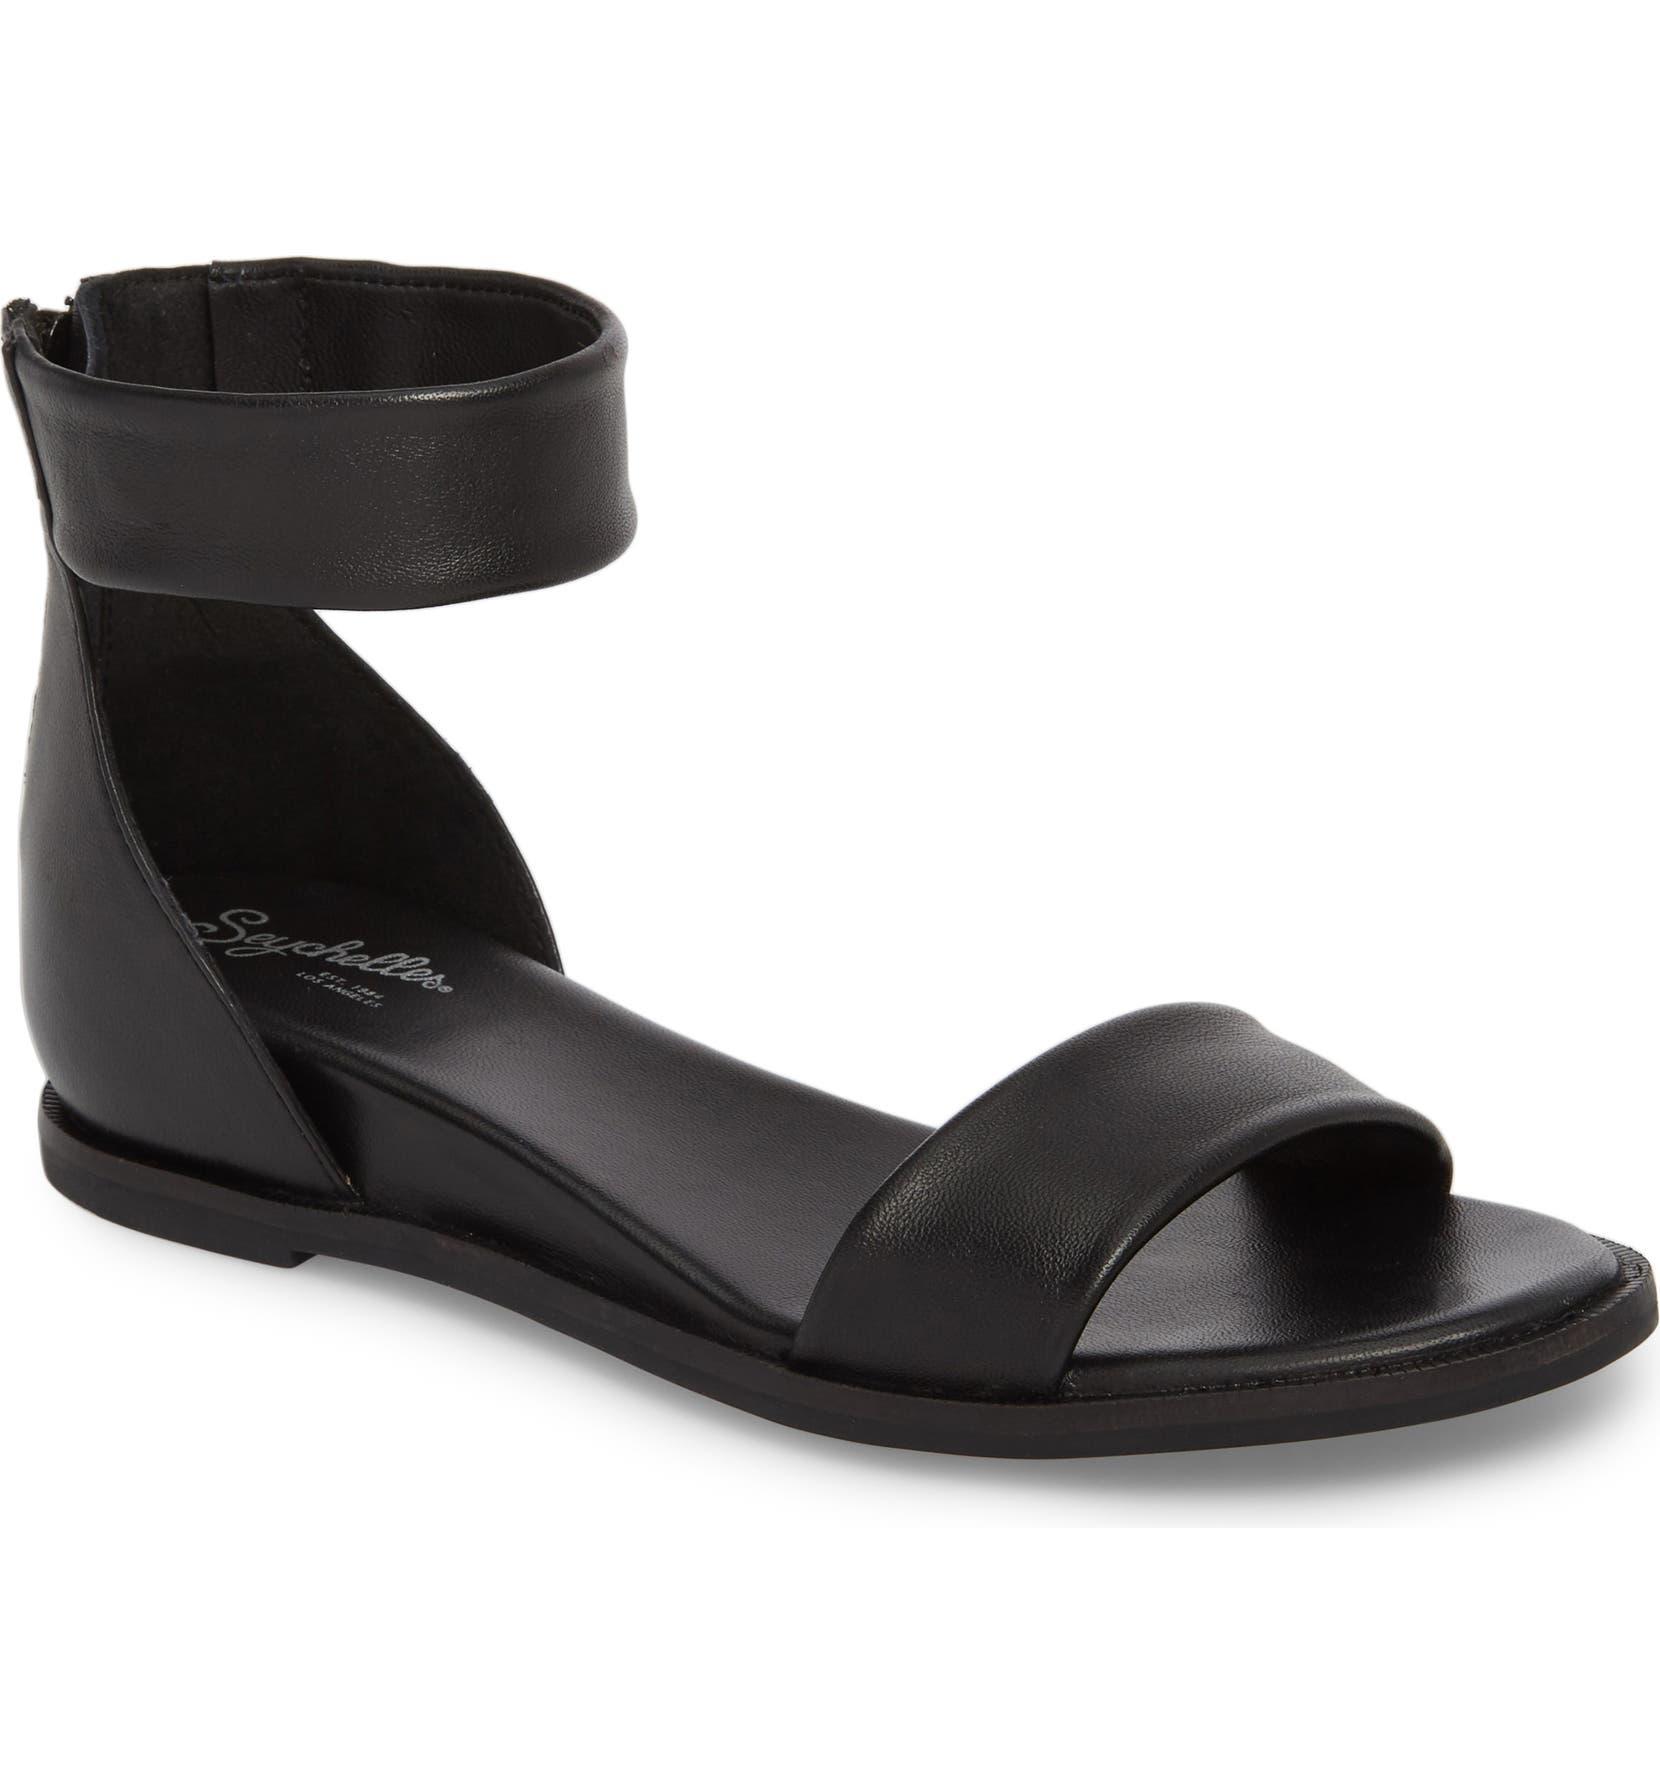 121c9c0b2fa Ankle Strap Sandal